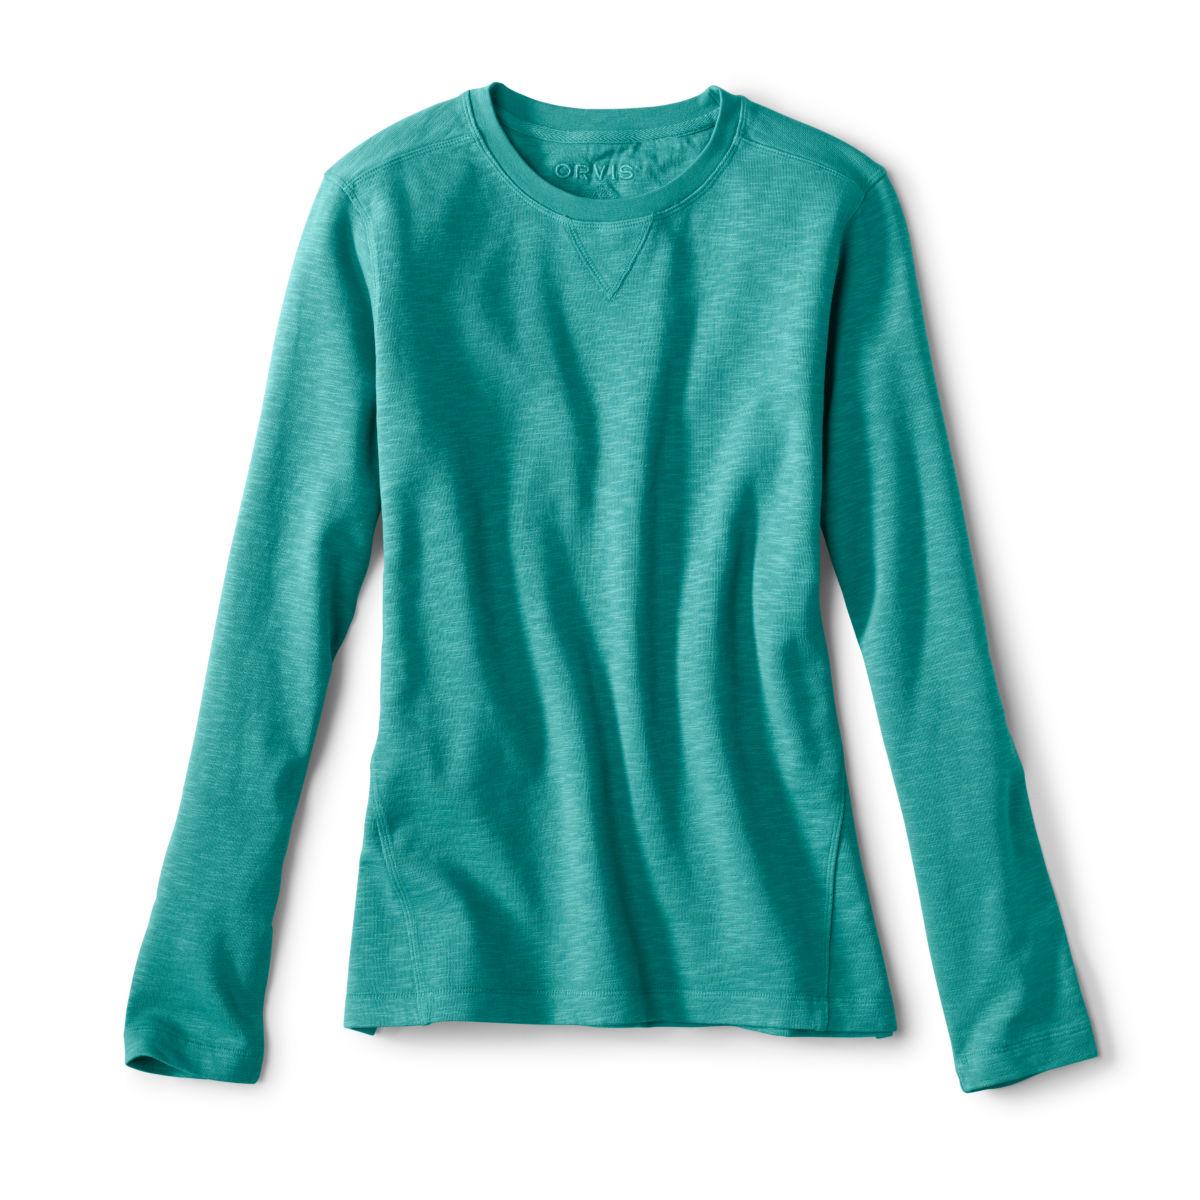 Sunwashed Crewneck Sweatshirt - TROPICAL BLUEimage number 0